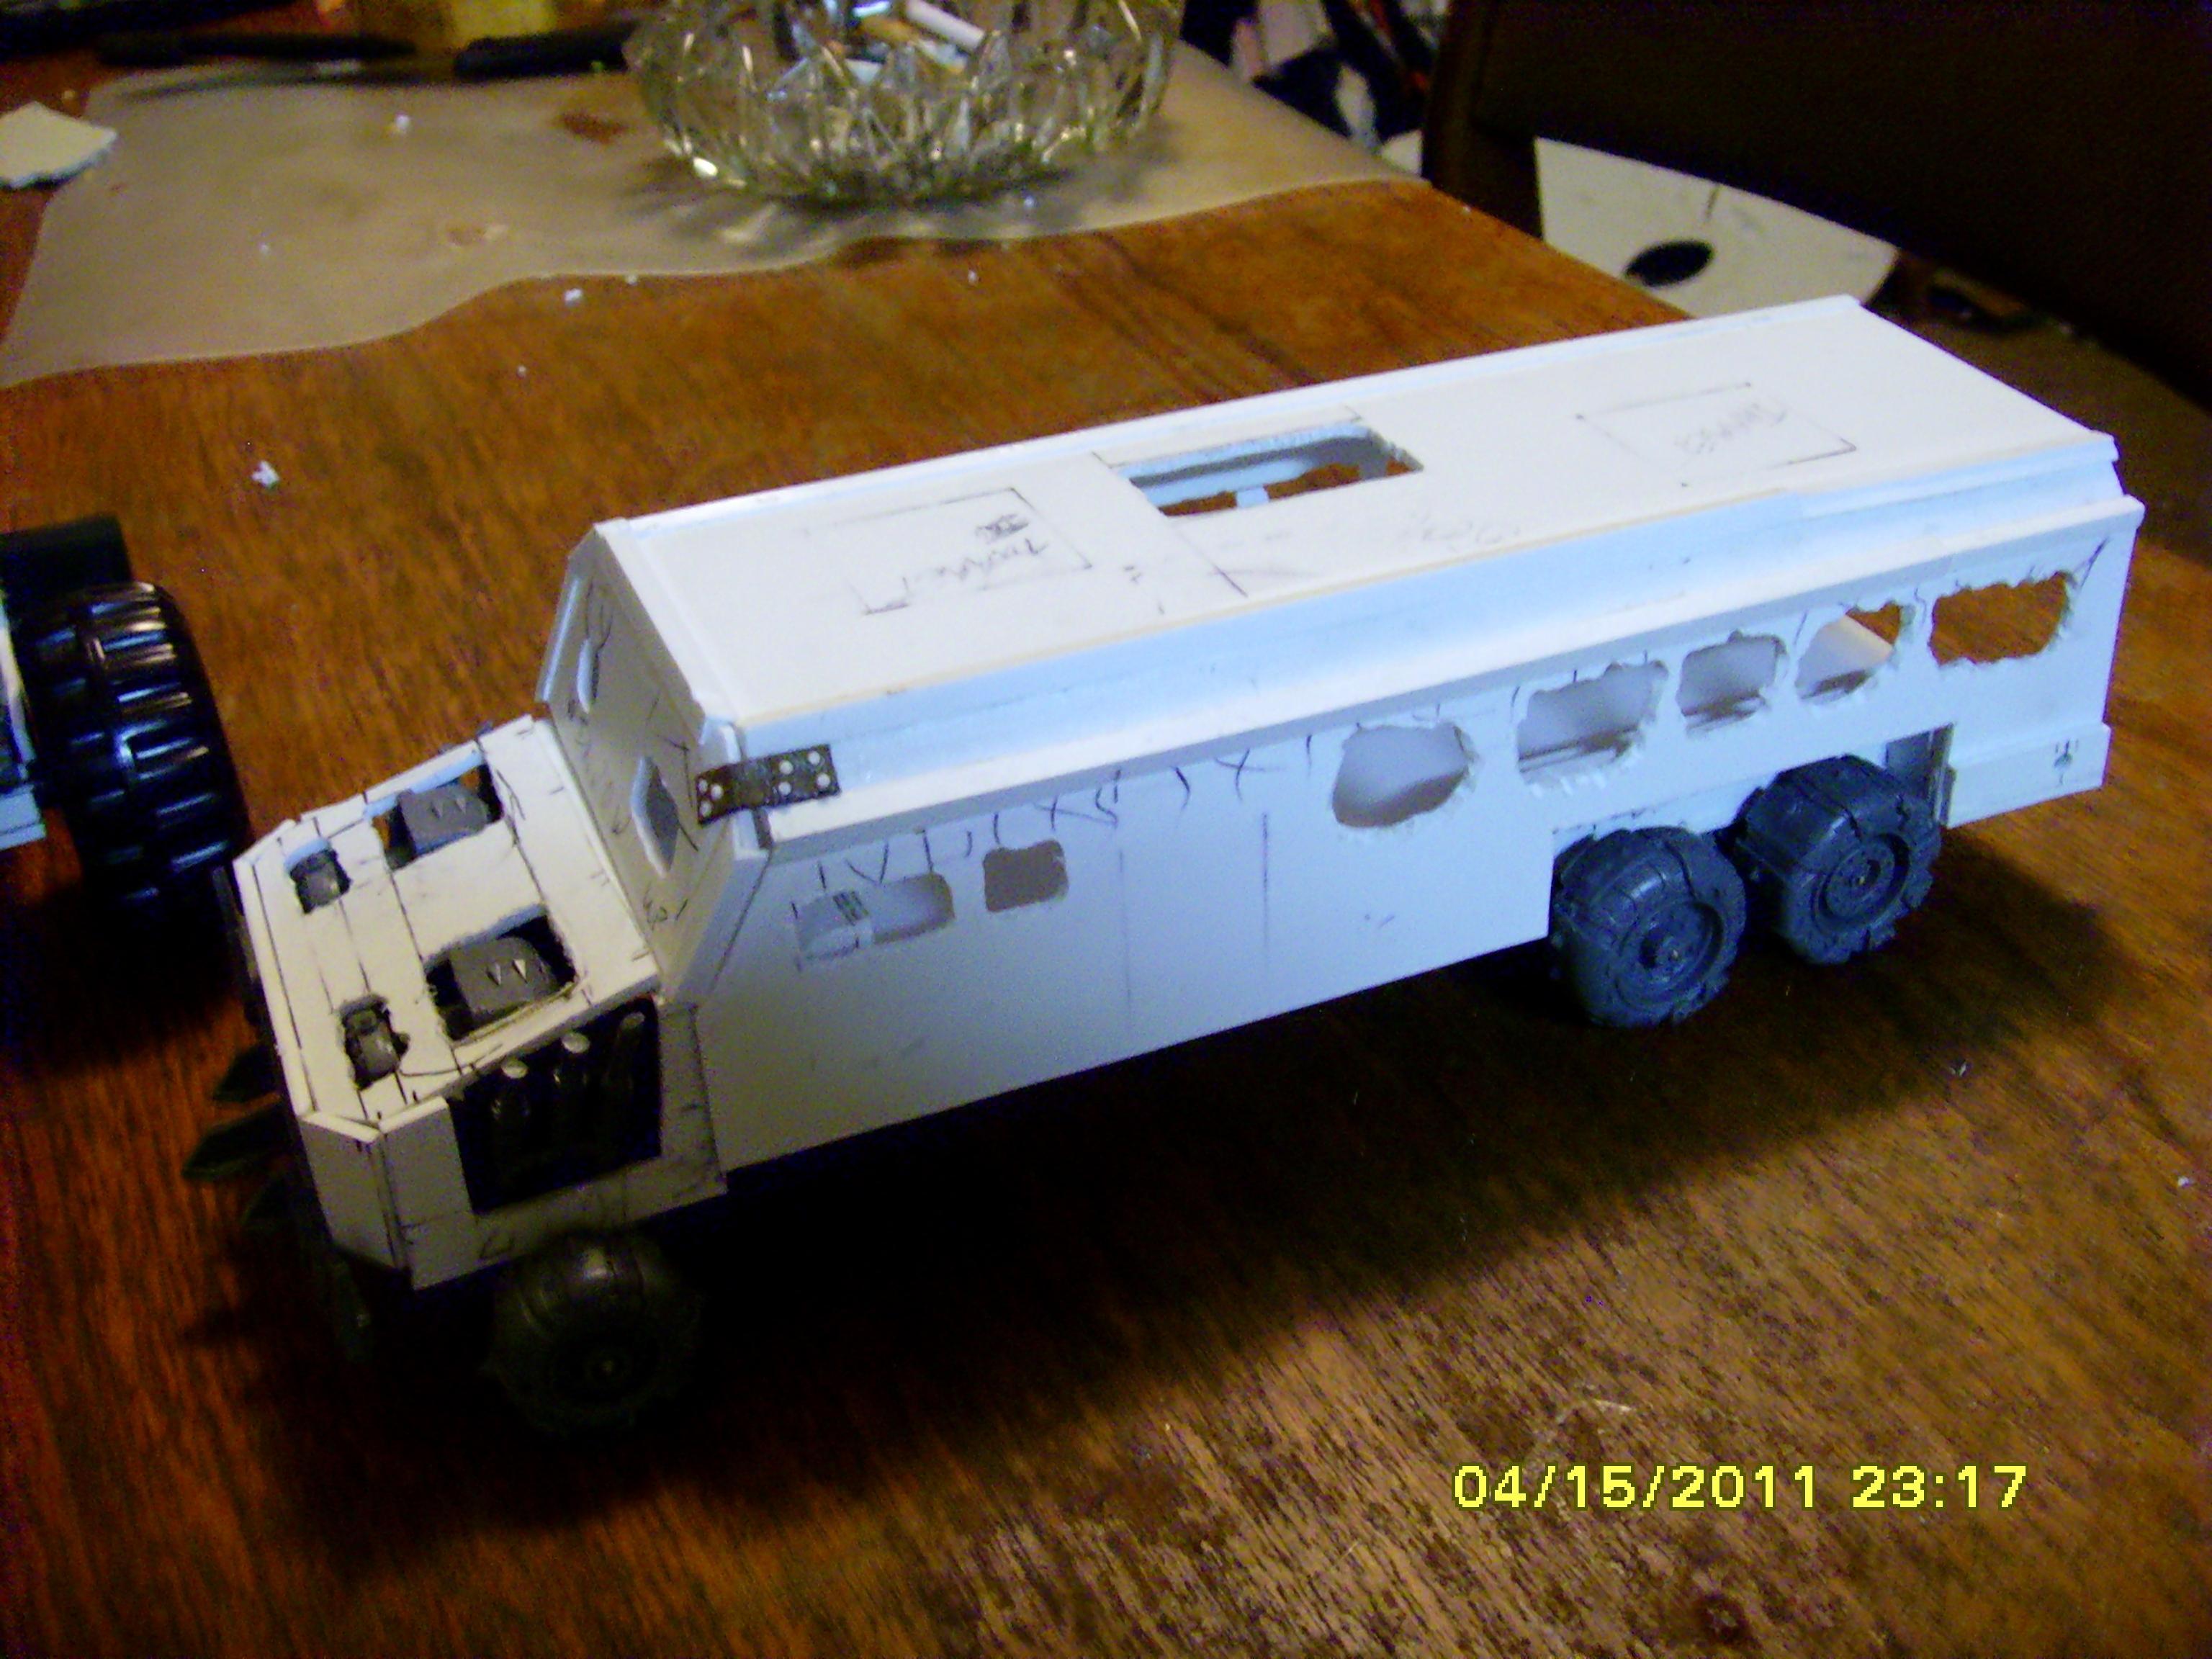 Battlewagon, Bus, Conversion, Orks, Scratch Build, Vehicle, Warhammer 40,000